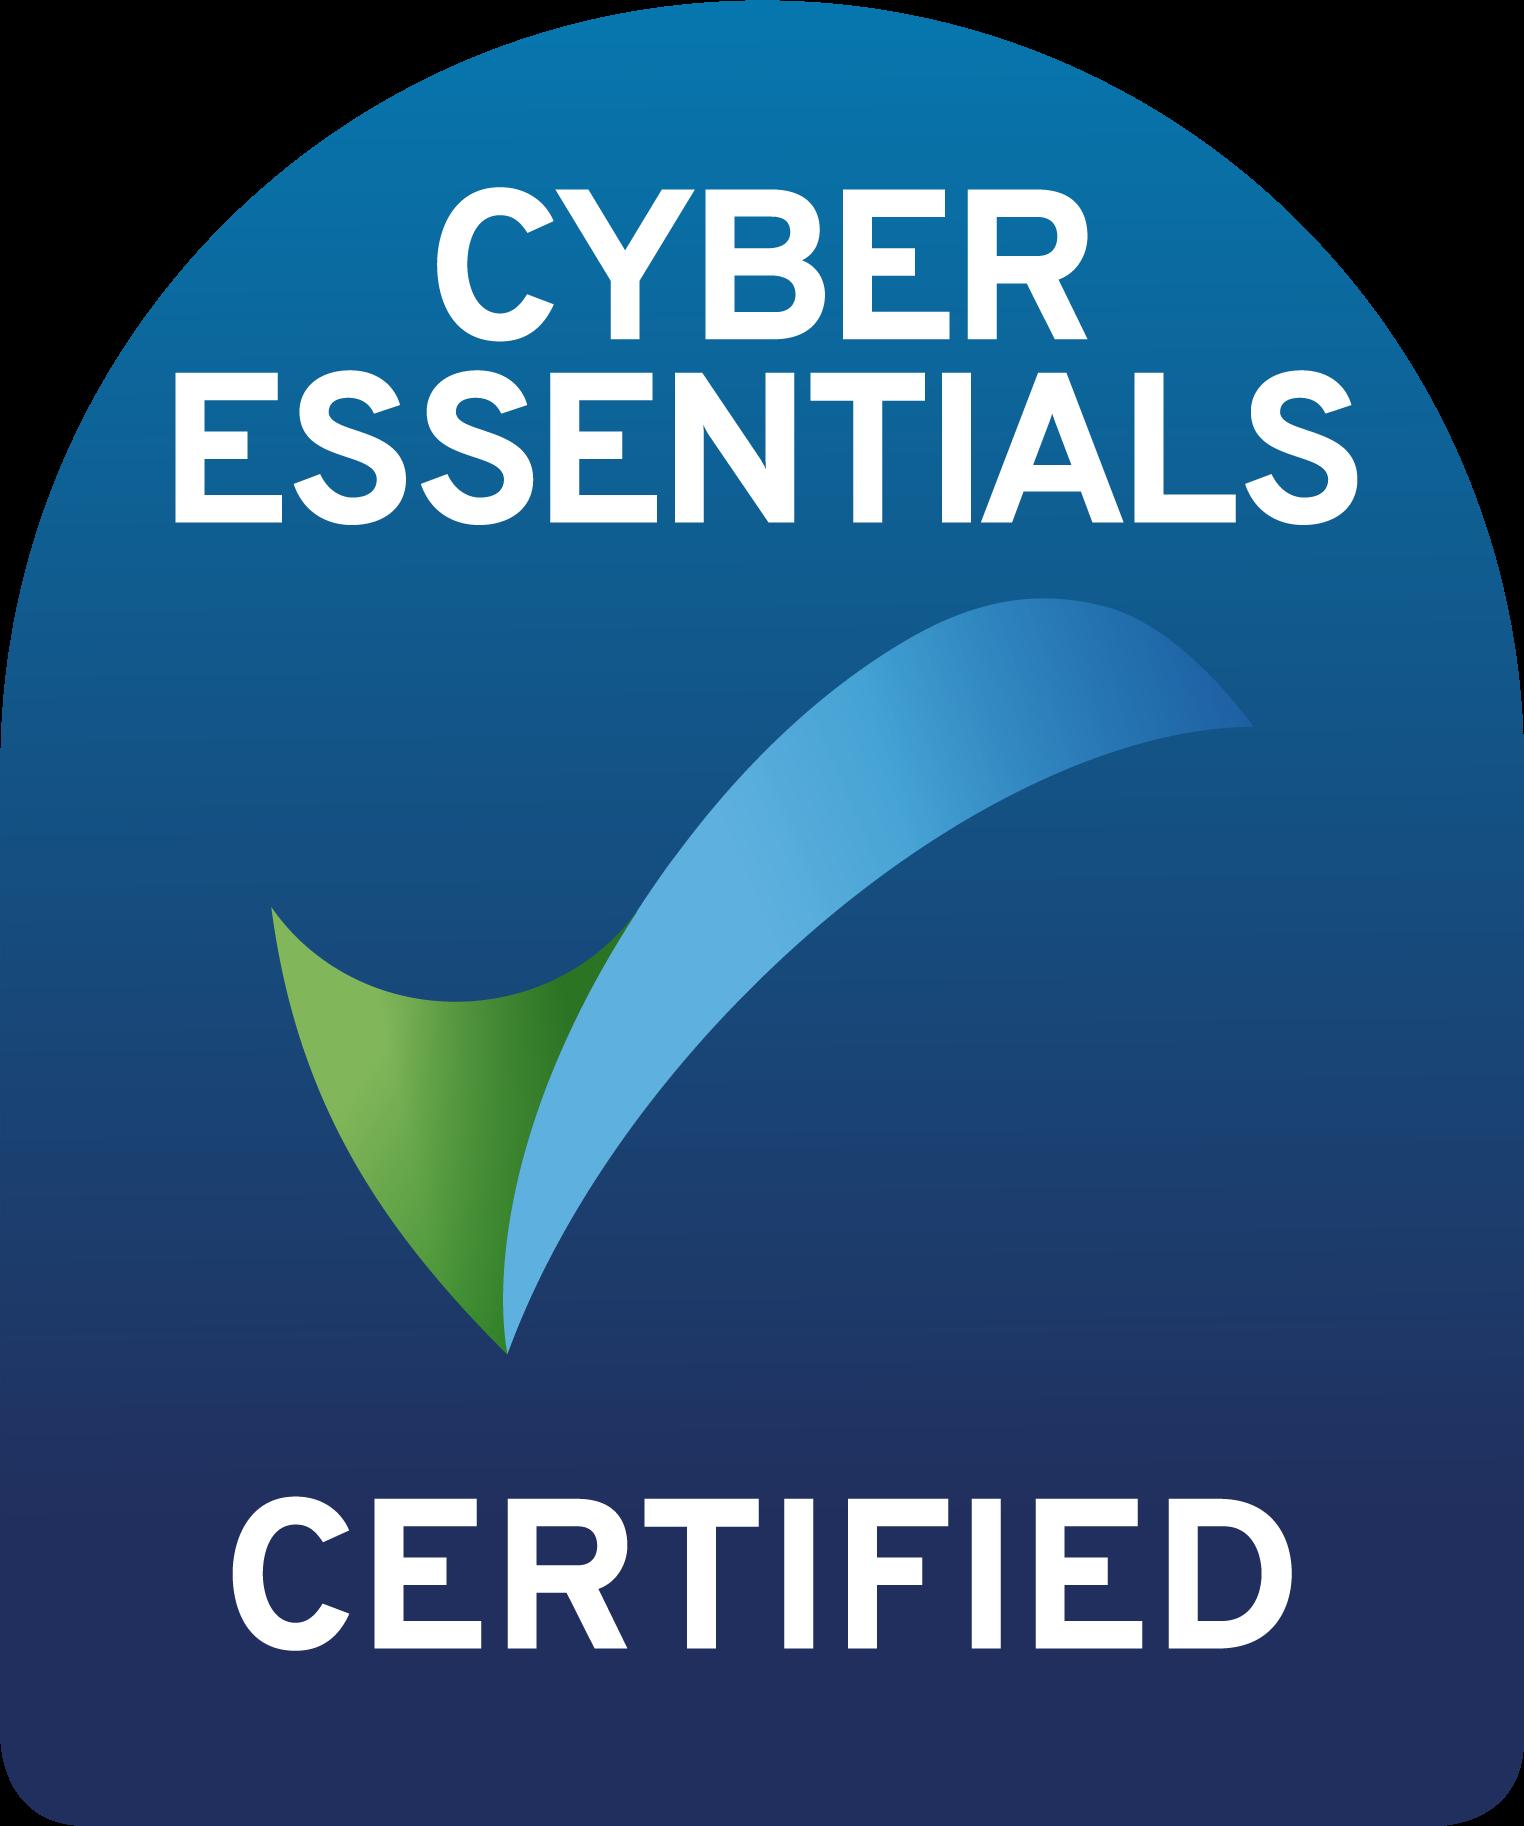 Cyberessentials certification mark colour